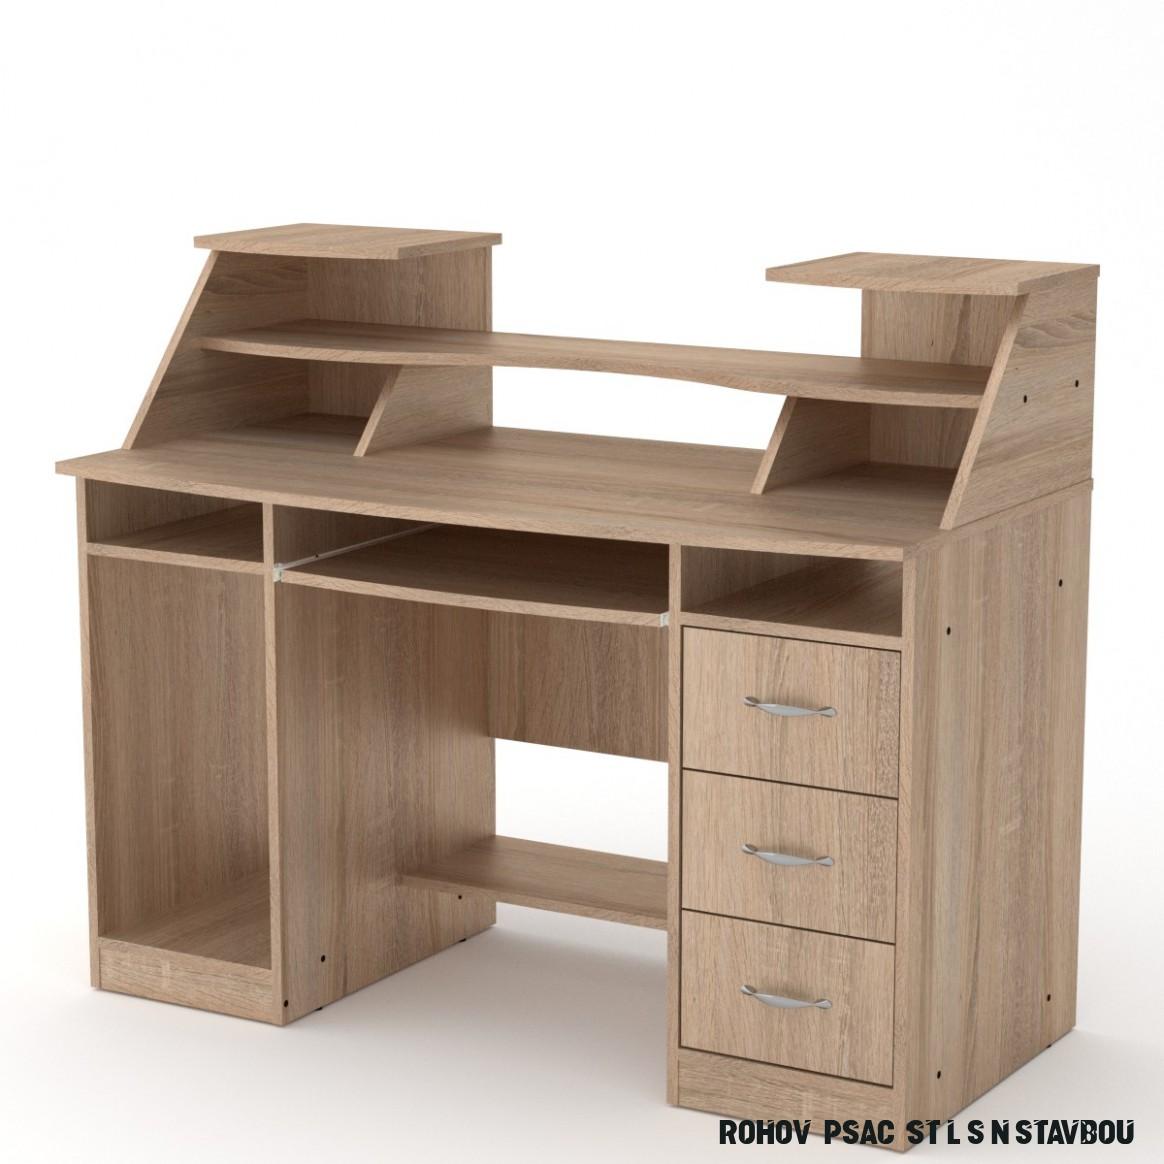 PC stůl SK KOMFORT 8 - 8x8cm - Nabytek z lesa.cz